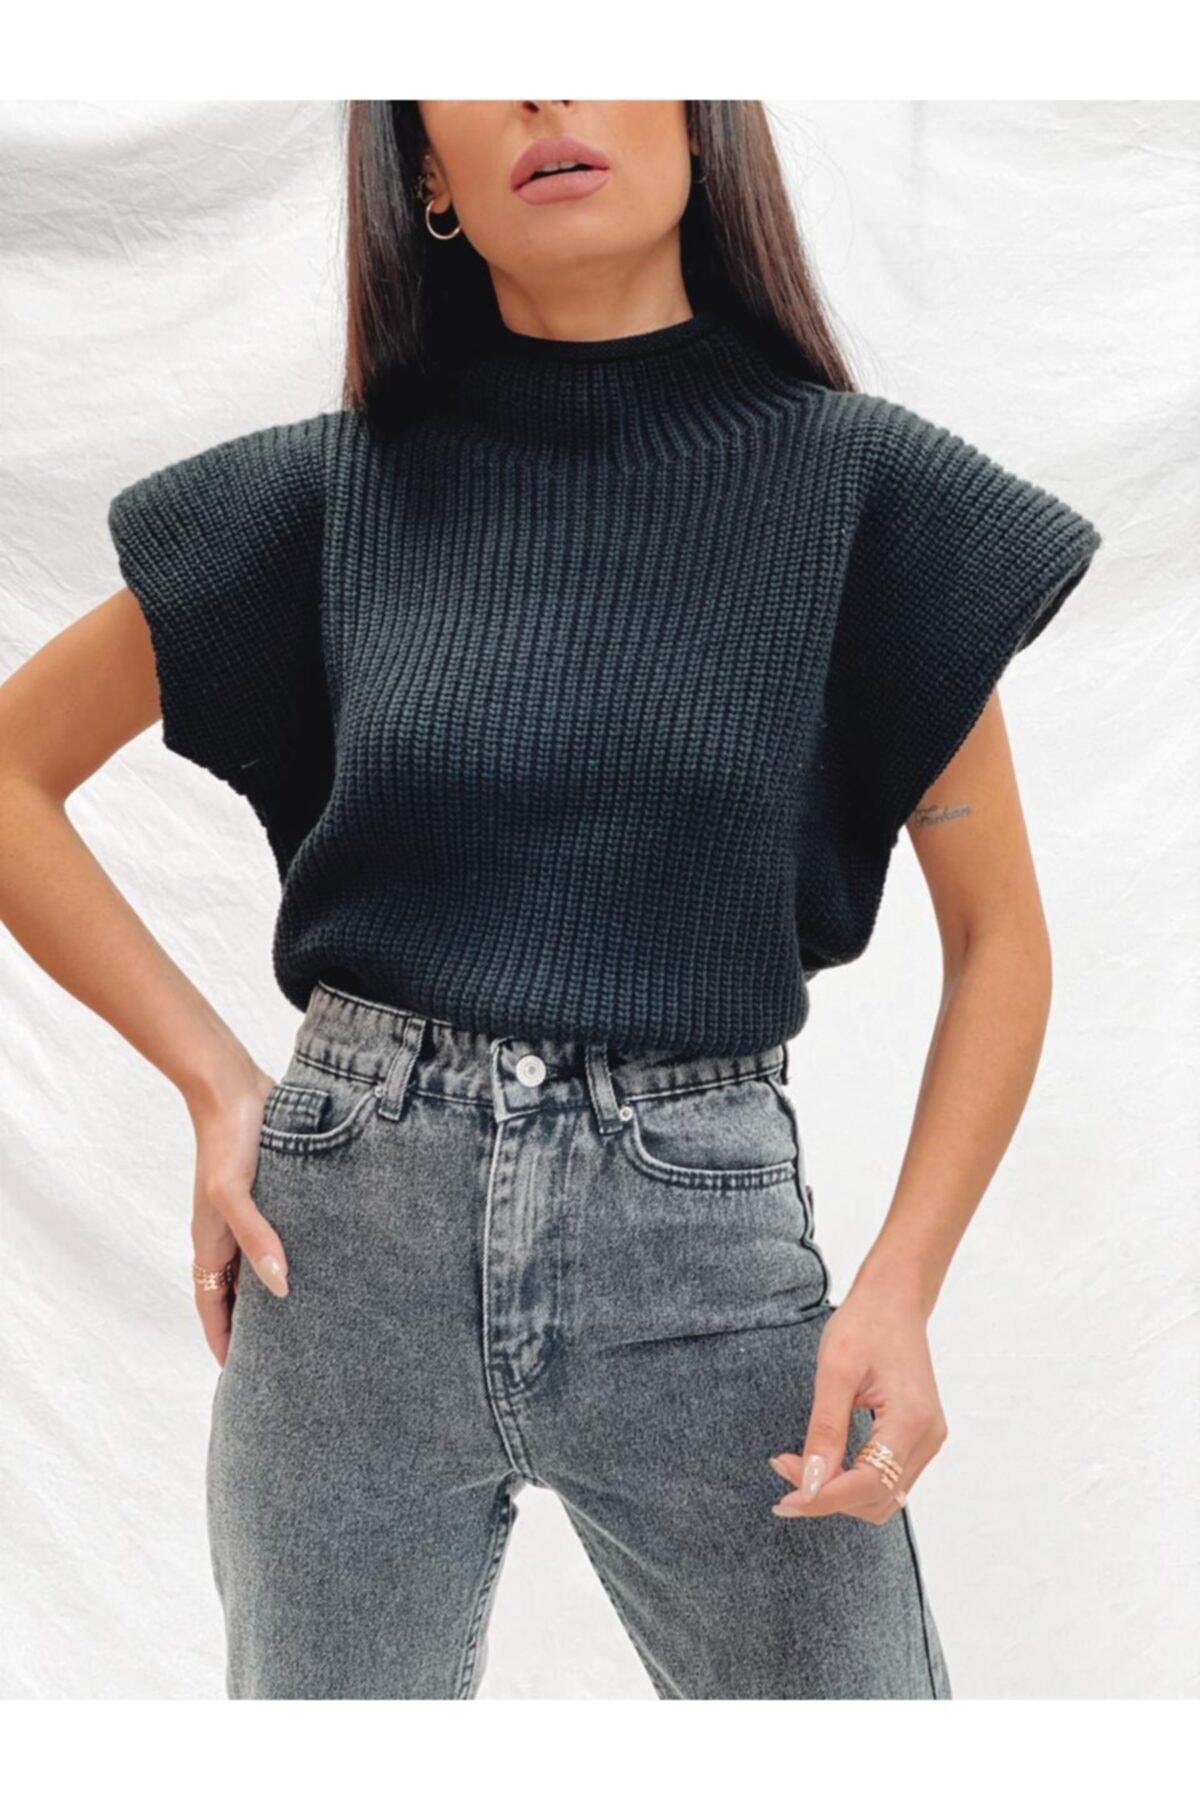 PurpuraVioleta Kadın Siyah Vatkalı Örme Bluz 1